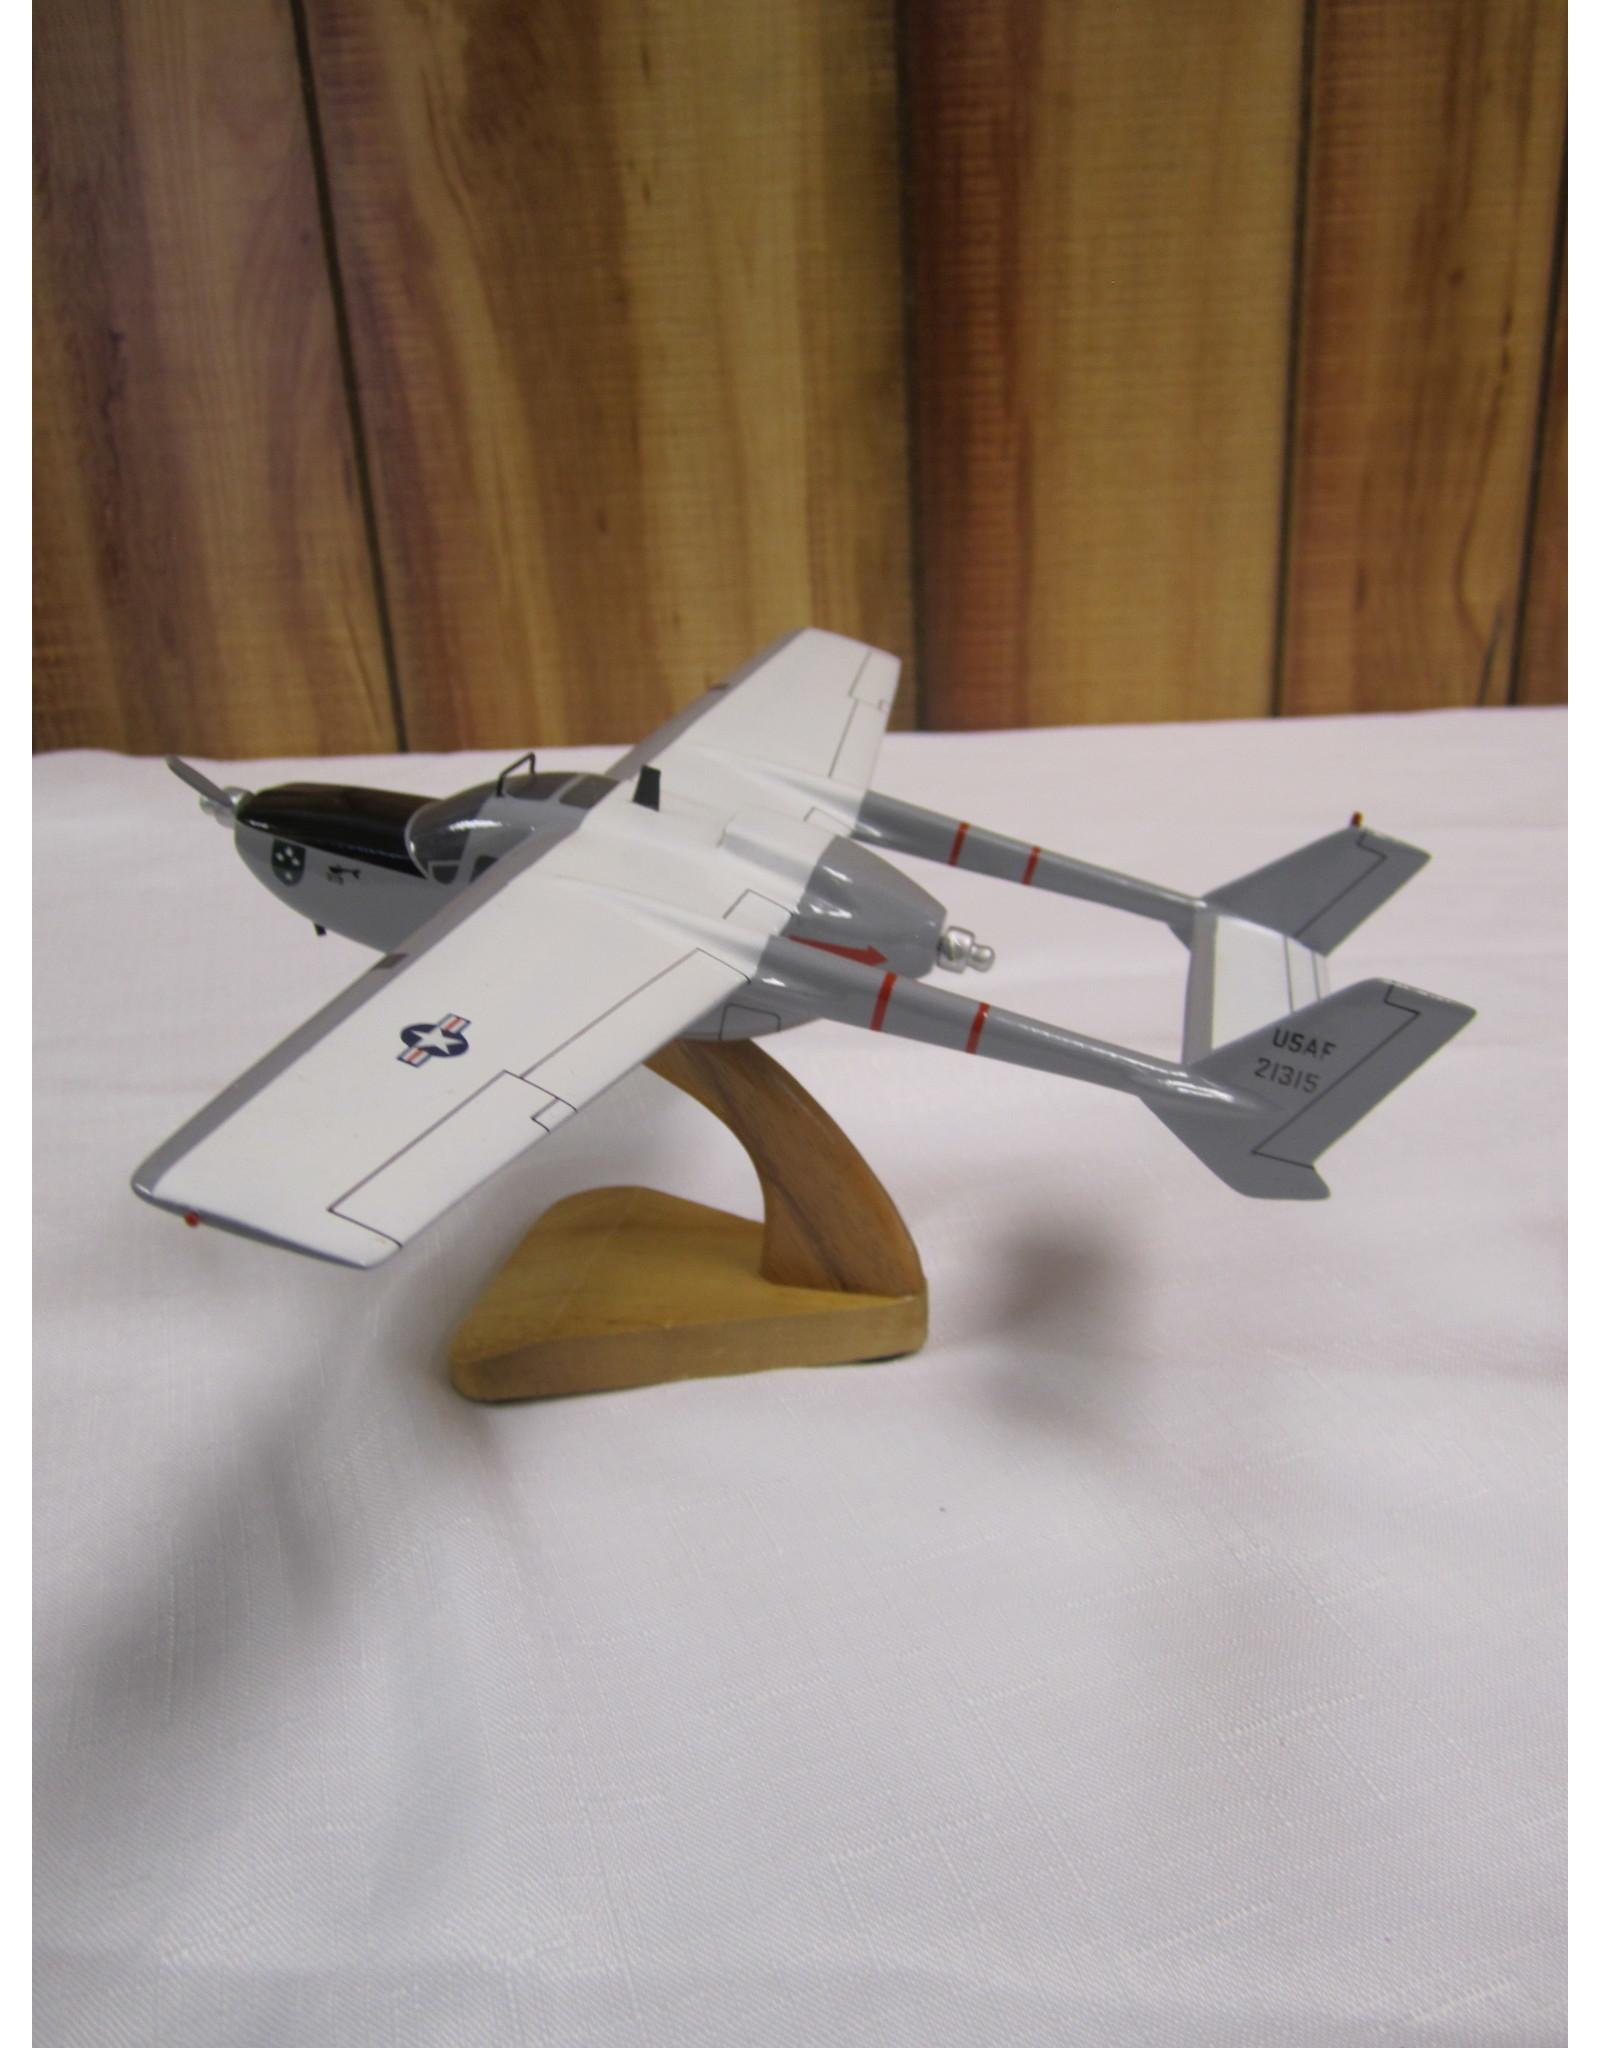 O-2 Skymaster Wood Model